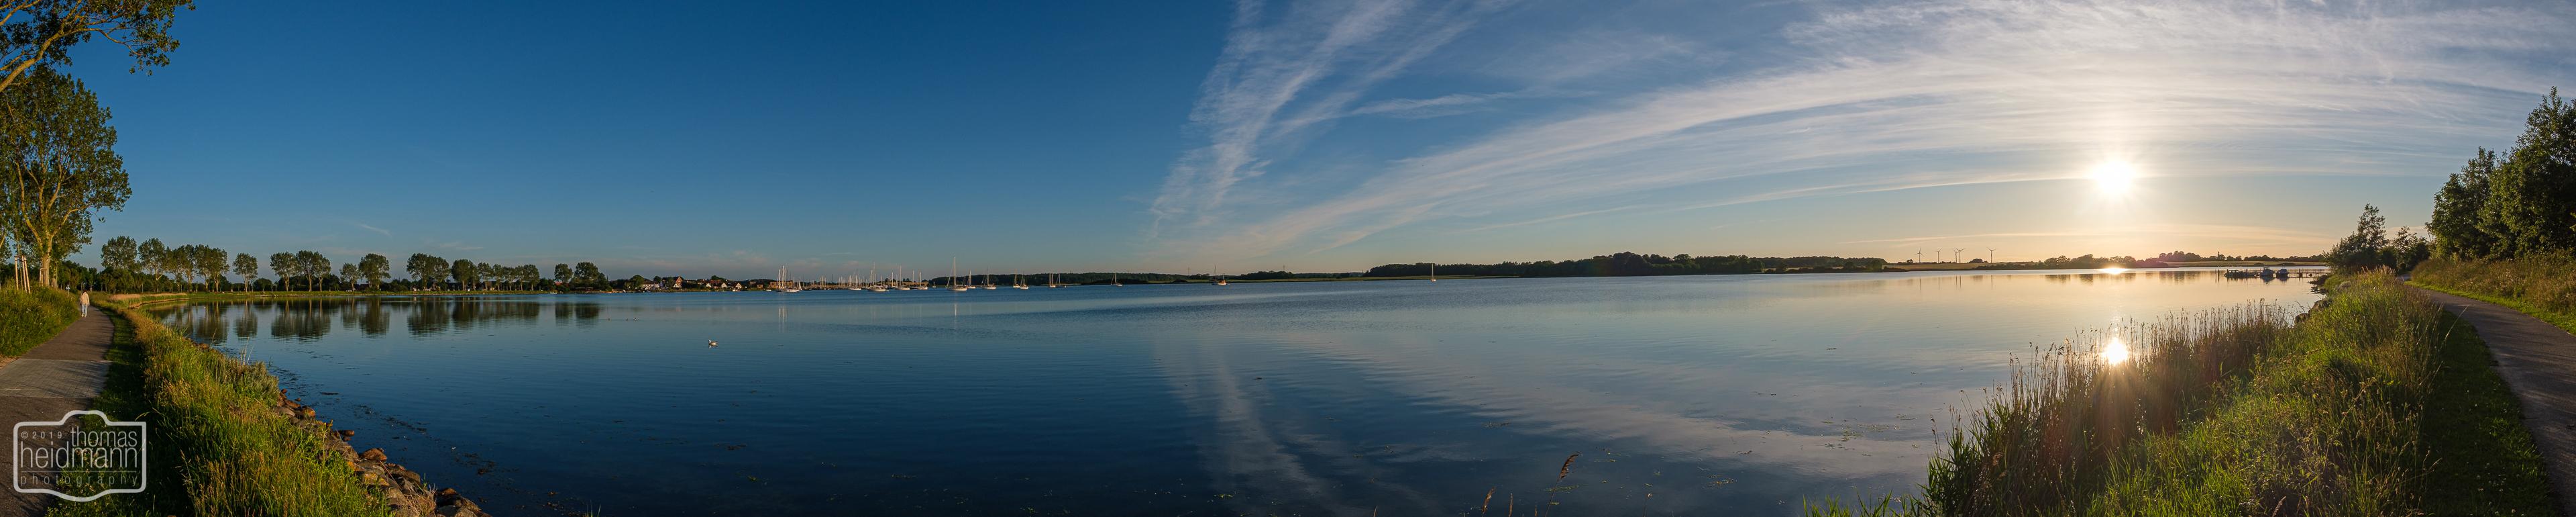 Sonnenuntergang in Maasholm